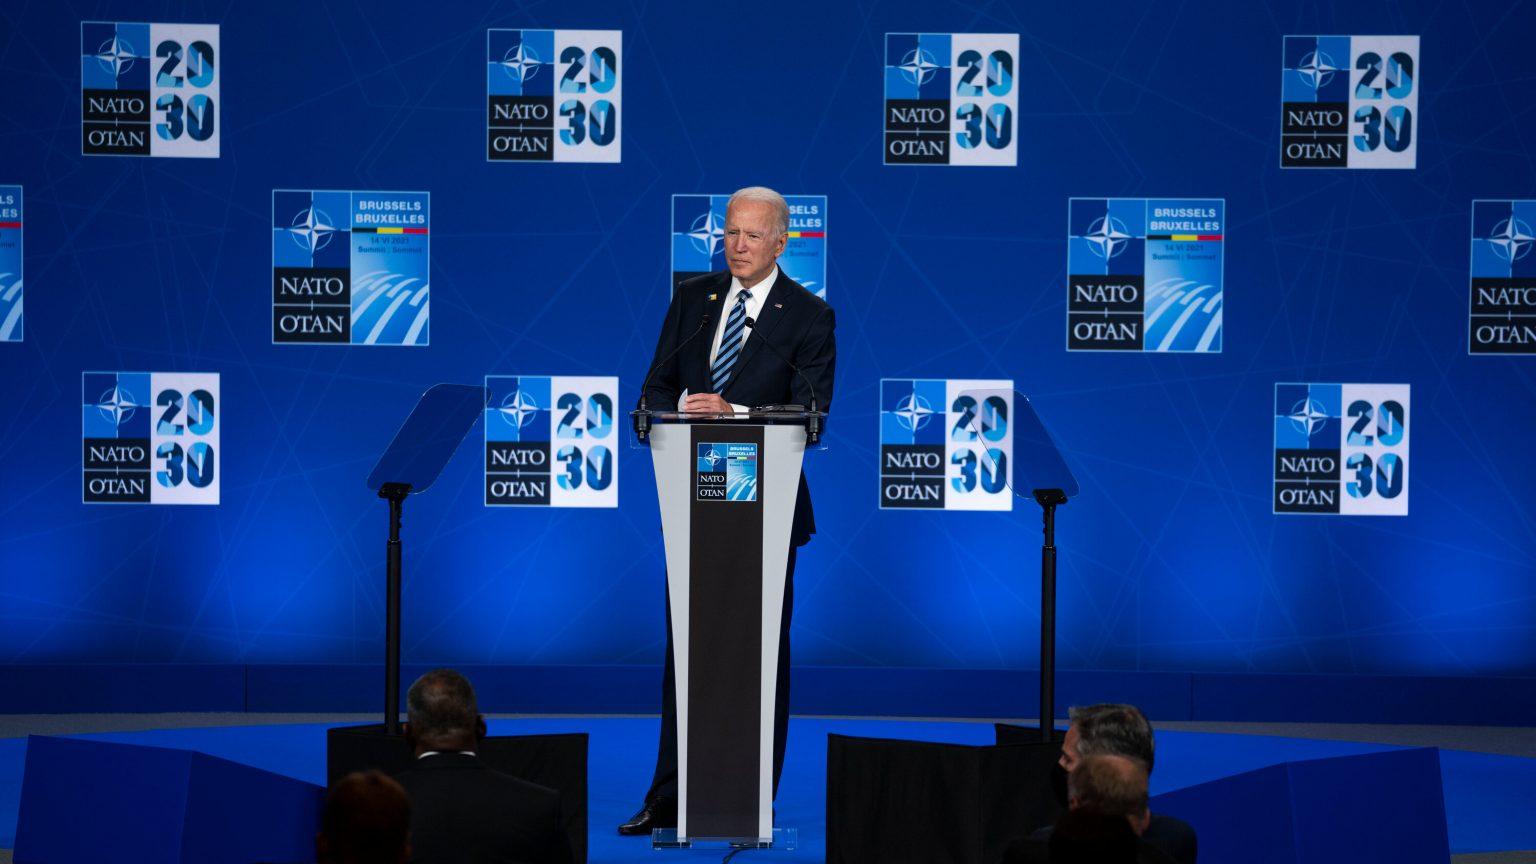 2021 NATO Summit Held in Brussels, Belgium | 2021 NATO సమ్మిట్ బెల్జియంలోని బ్రస్సెల్స్ లో జరిగింది |_40.1